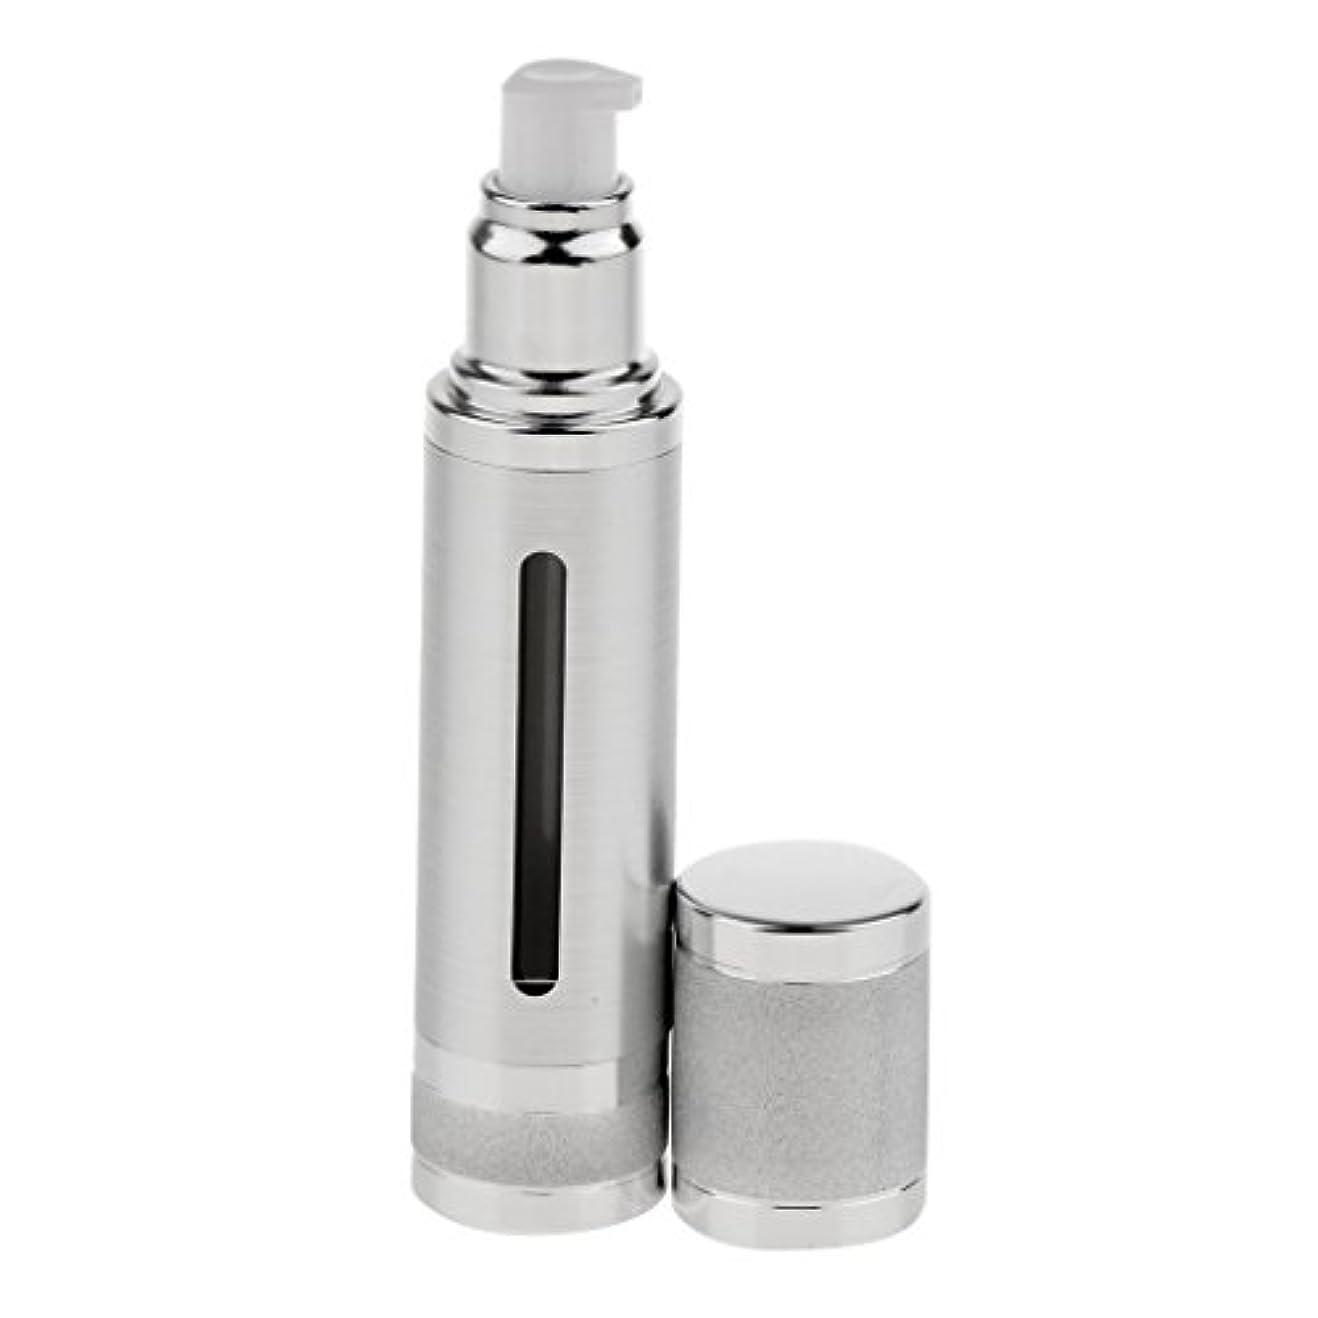 Kesoto エアレスボトル 50ml エアレス ポンプボトル ローション クリーム 化粧品 詰め替え可 容器 2色選べる - 銀